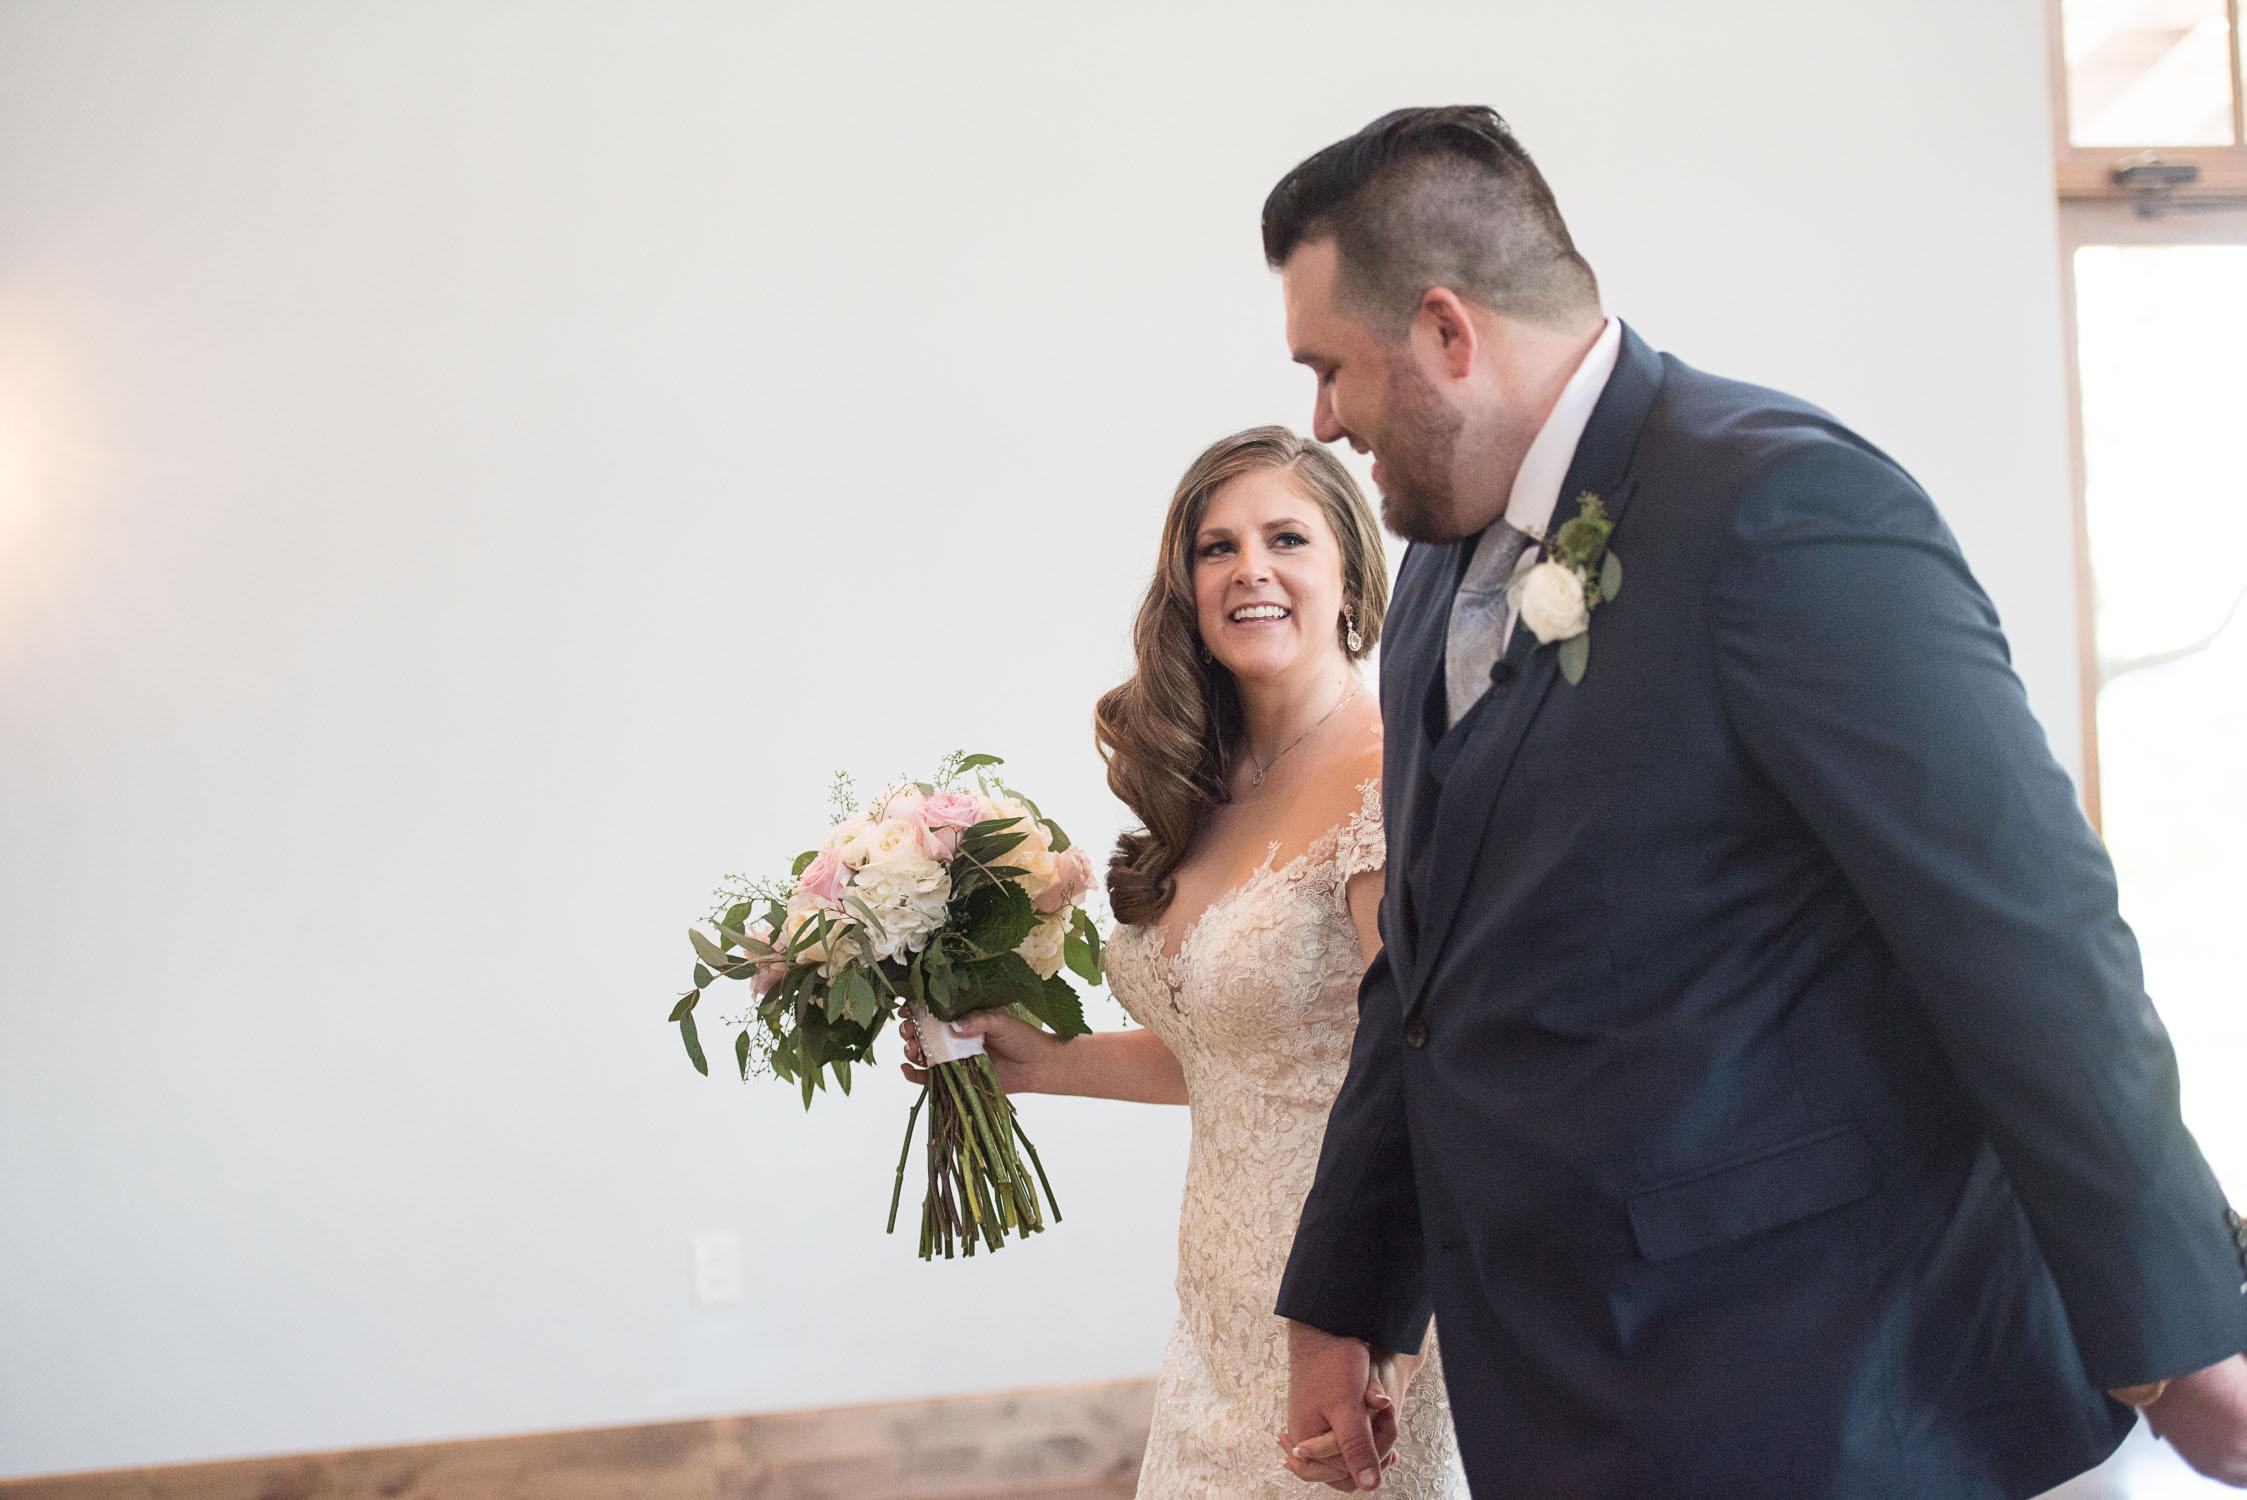 Hinton Wedding at Canyonwood Ridge Dripping Springs Texas Wedding Photography-119.jpg